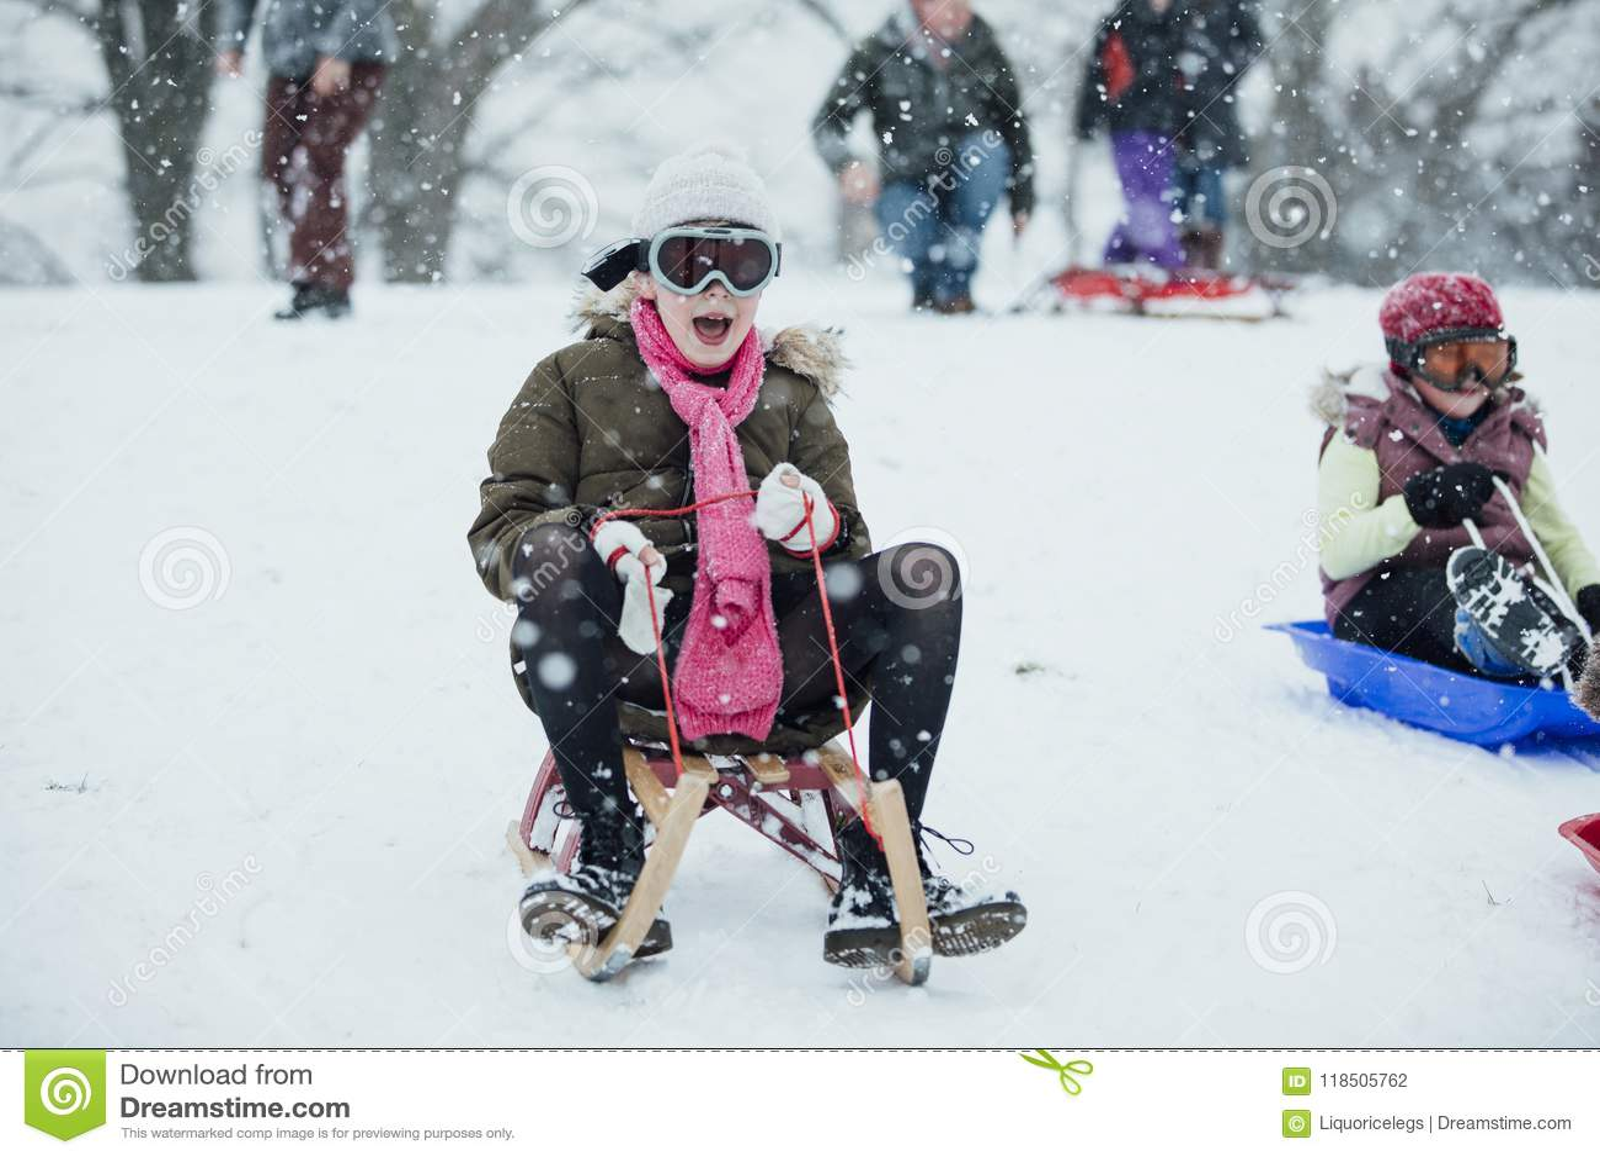 Sledding Down the Hill stock photo. Image of christmas - 118505762